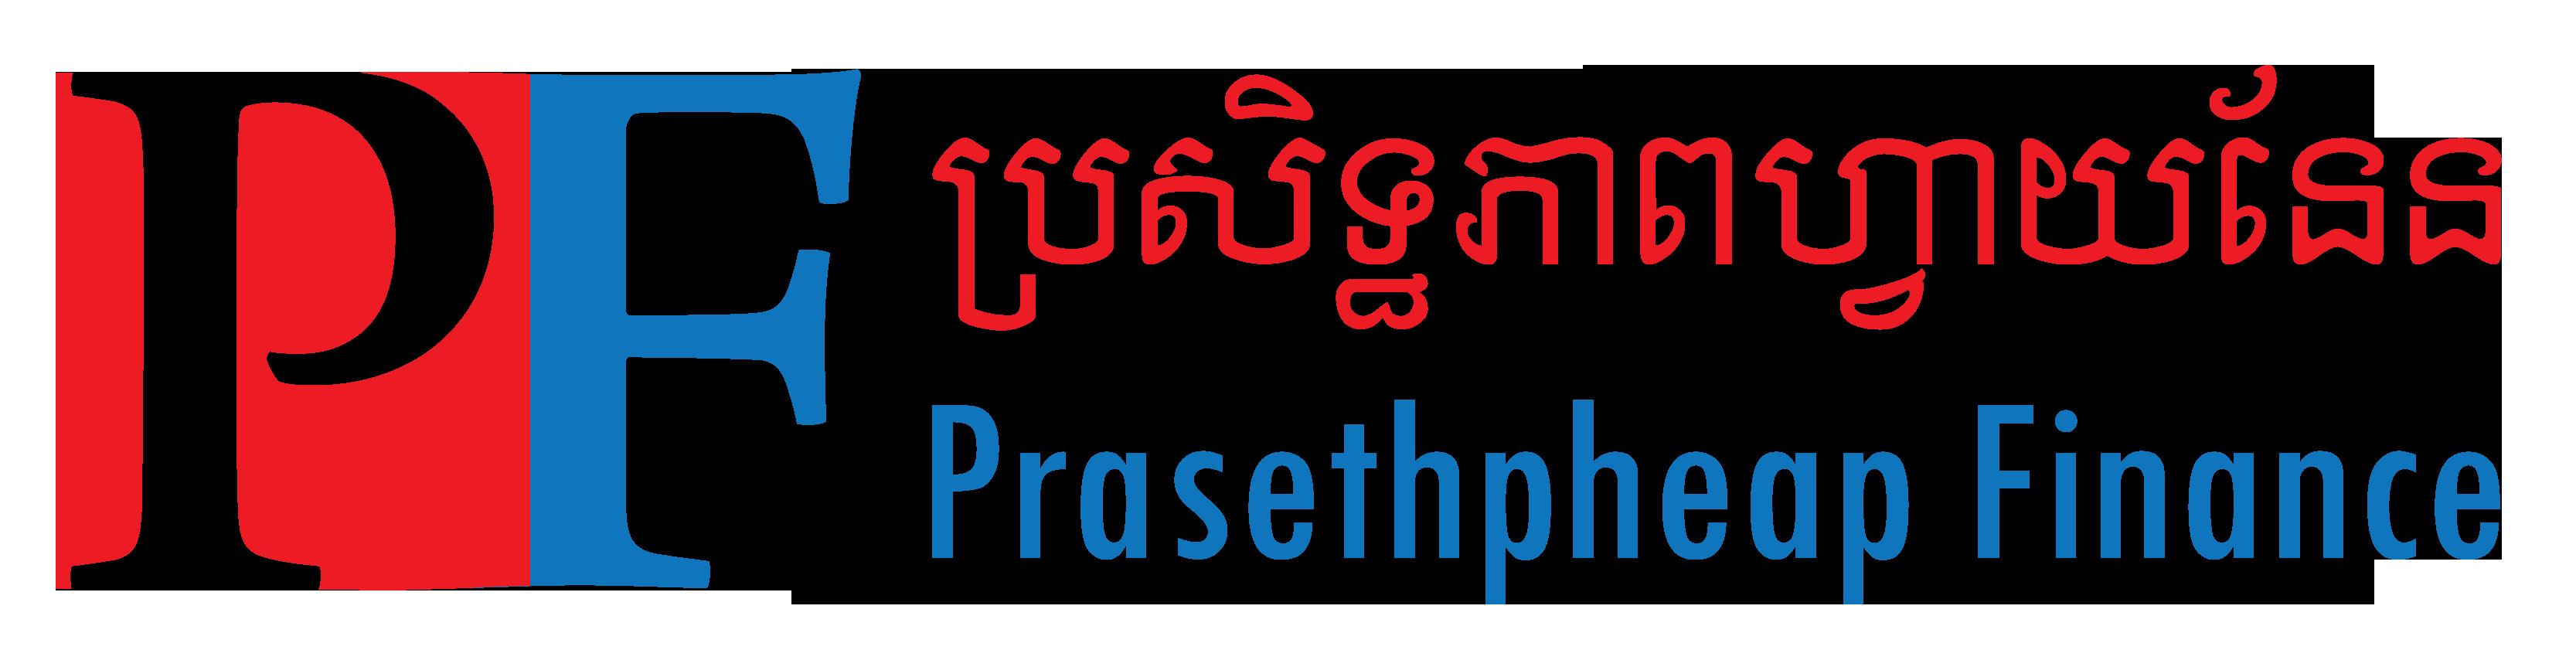 Home prasethpheap. Finance clipart performance highlights